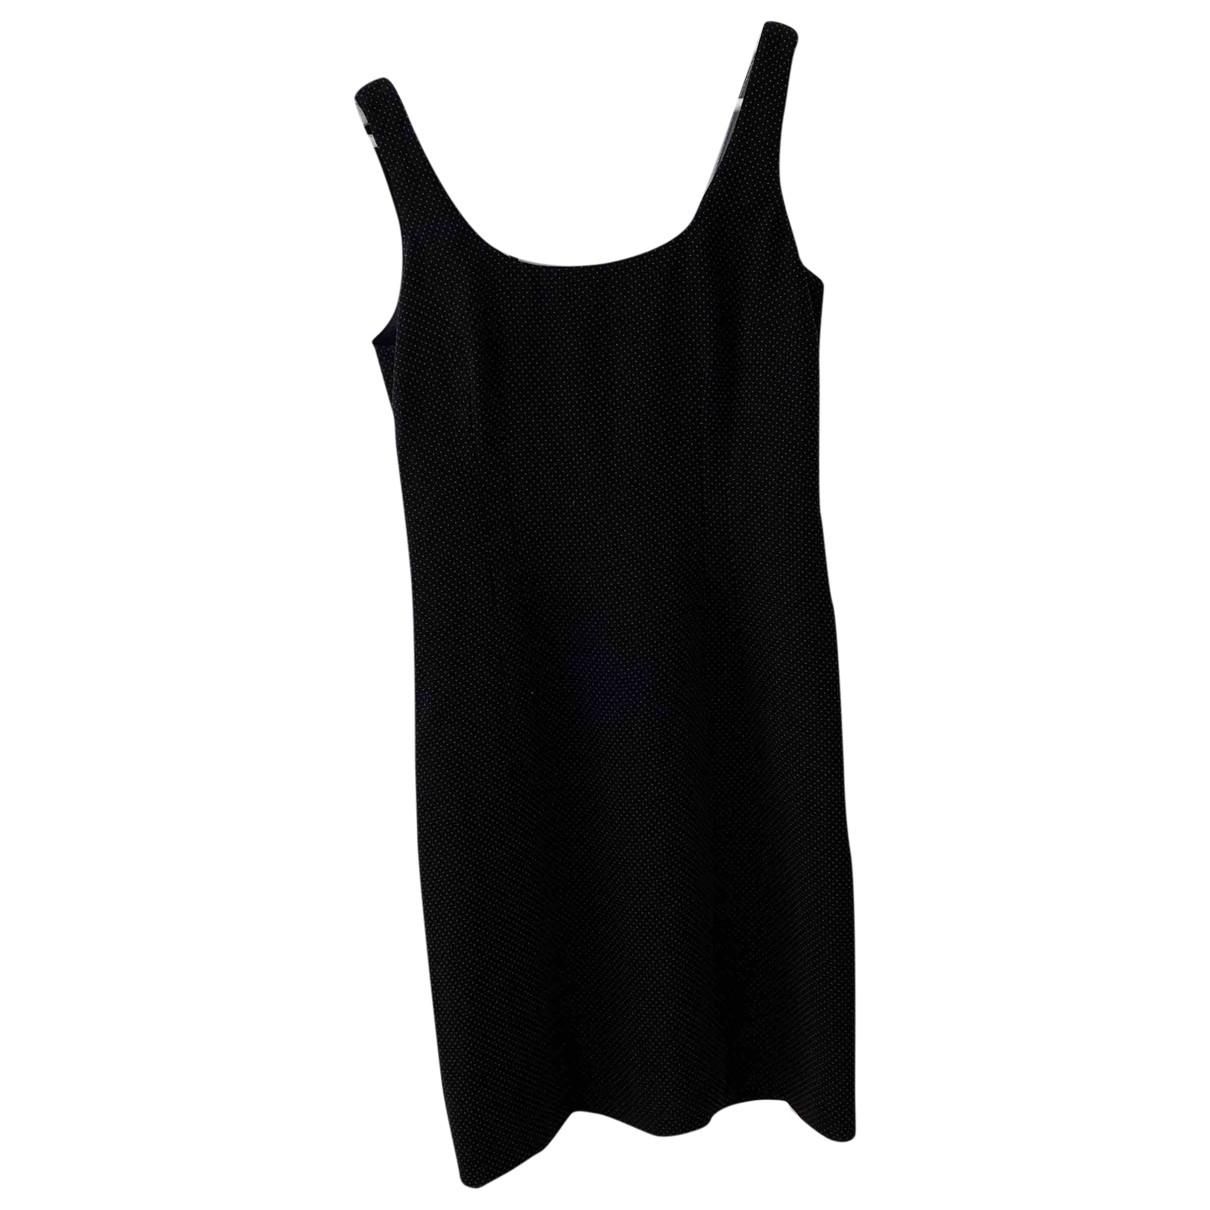 Emporio Armani \N Black dress for Women M International